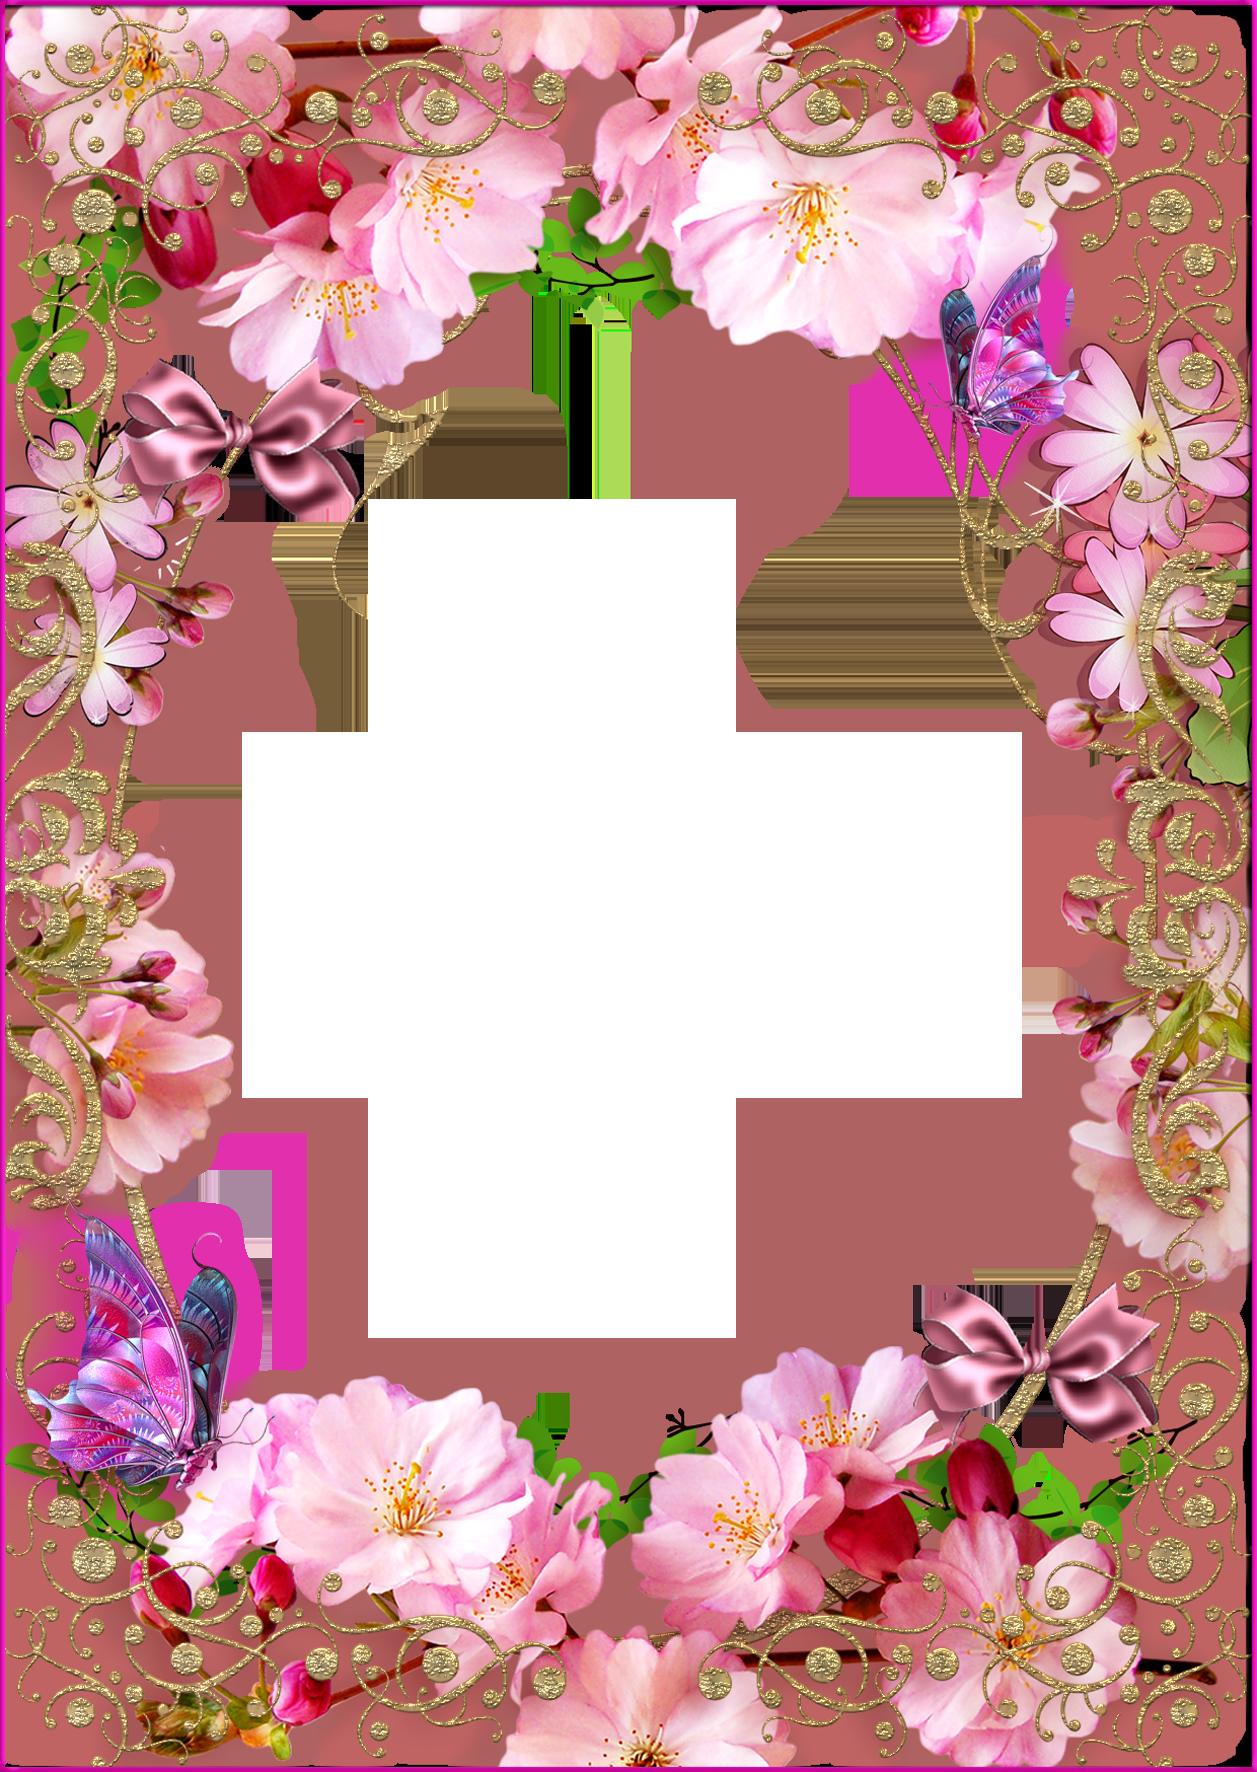 http://img-fotki.yandex.ru/get/5013/41771327.1db/0_628f0_23773cf8_orig.png